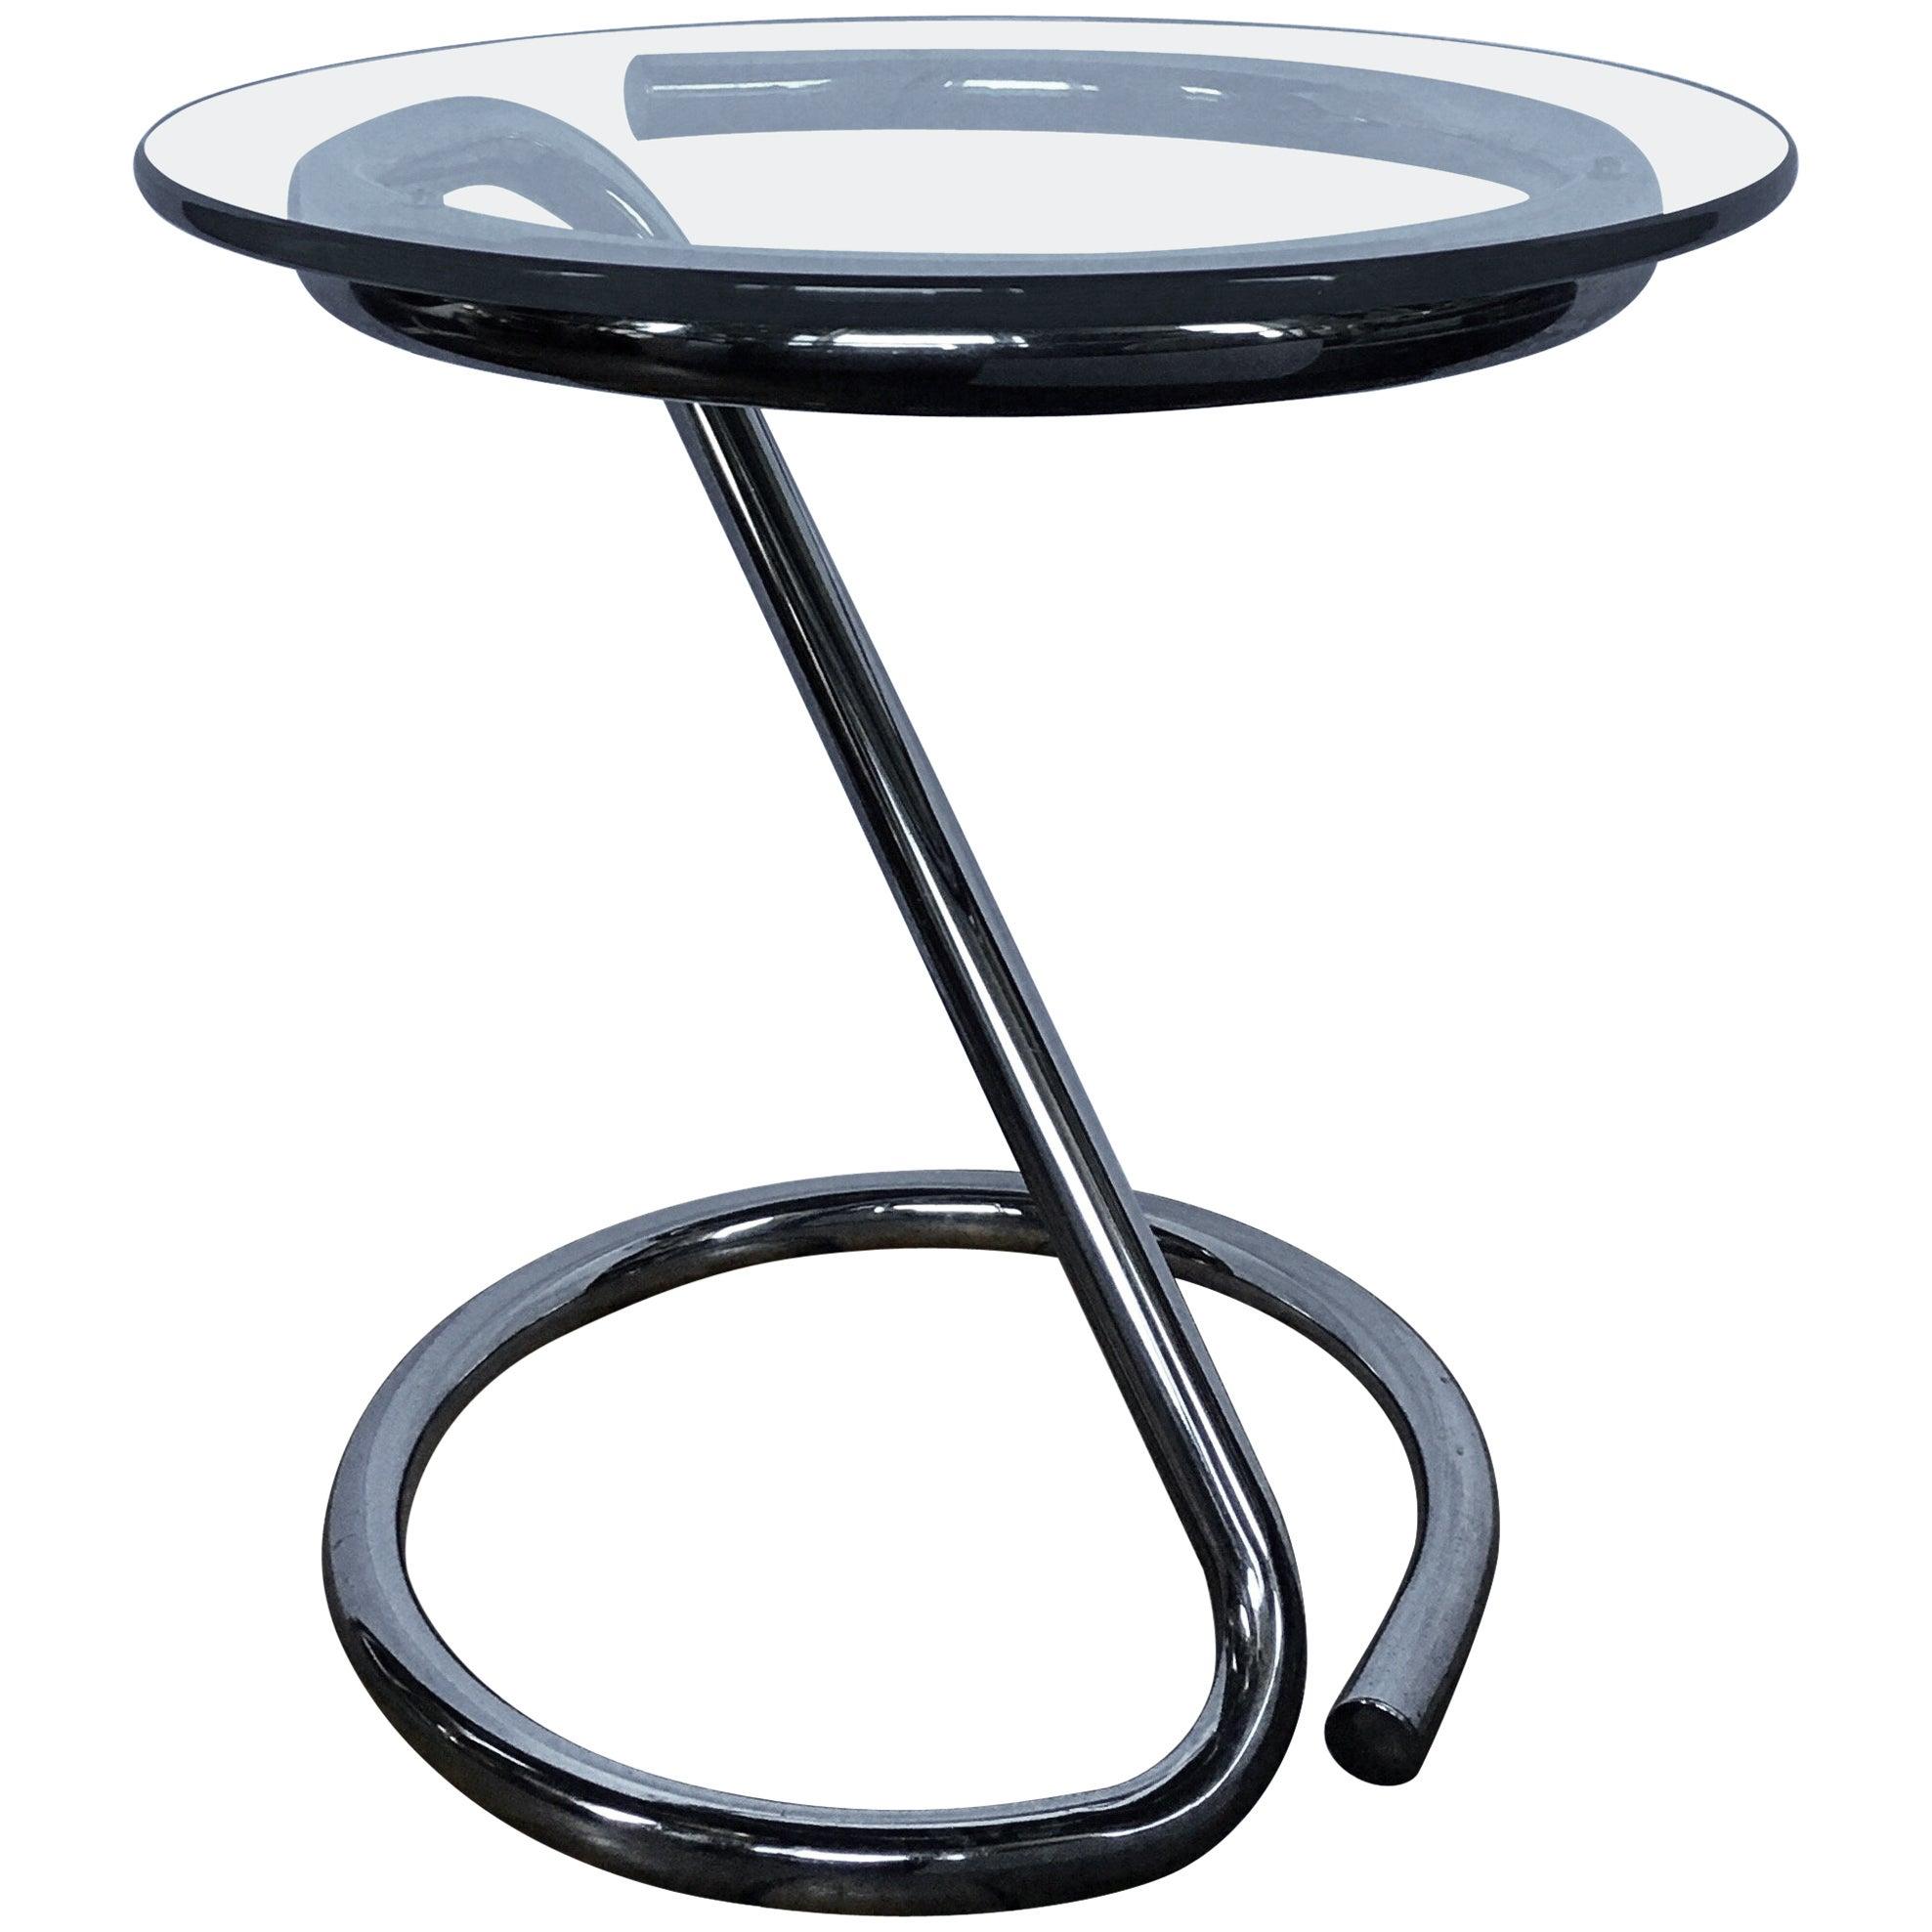 Mid-Century Modern Sculptural Chrome and Glass Tubular Side Table